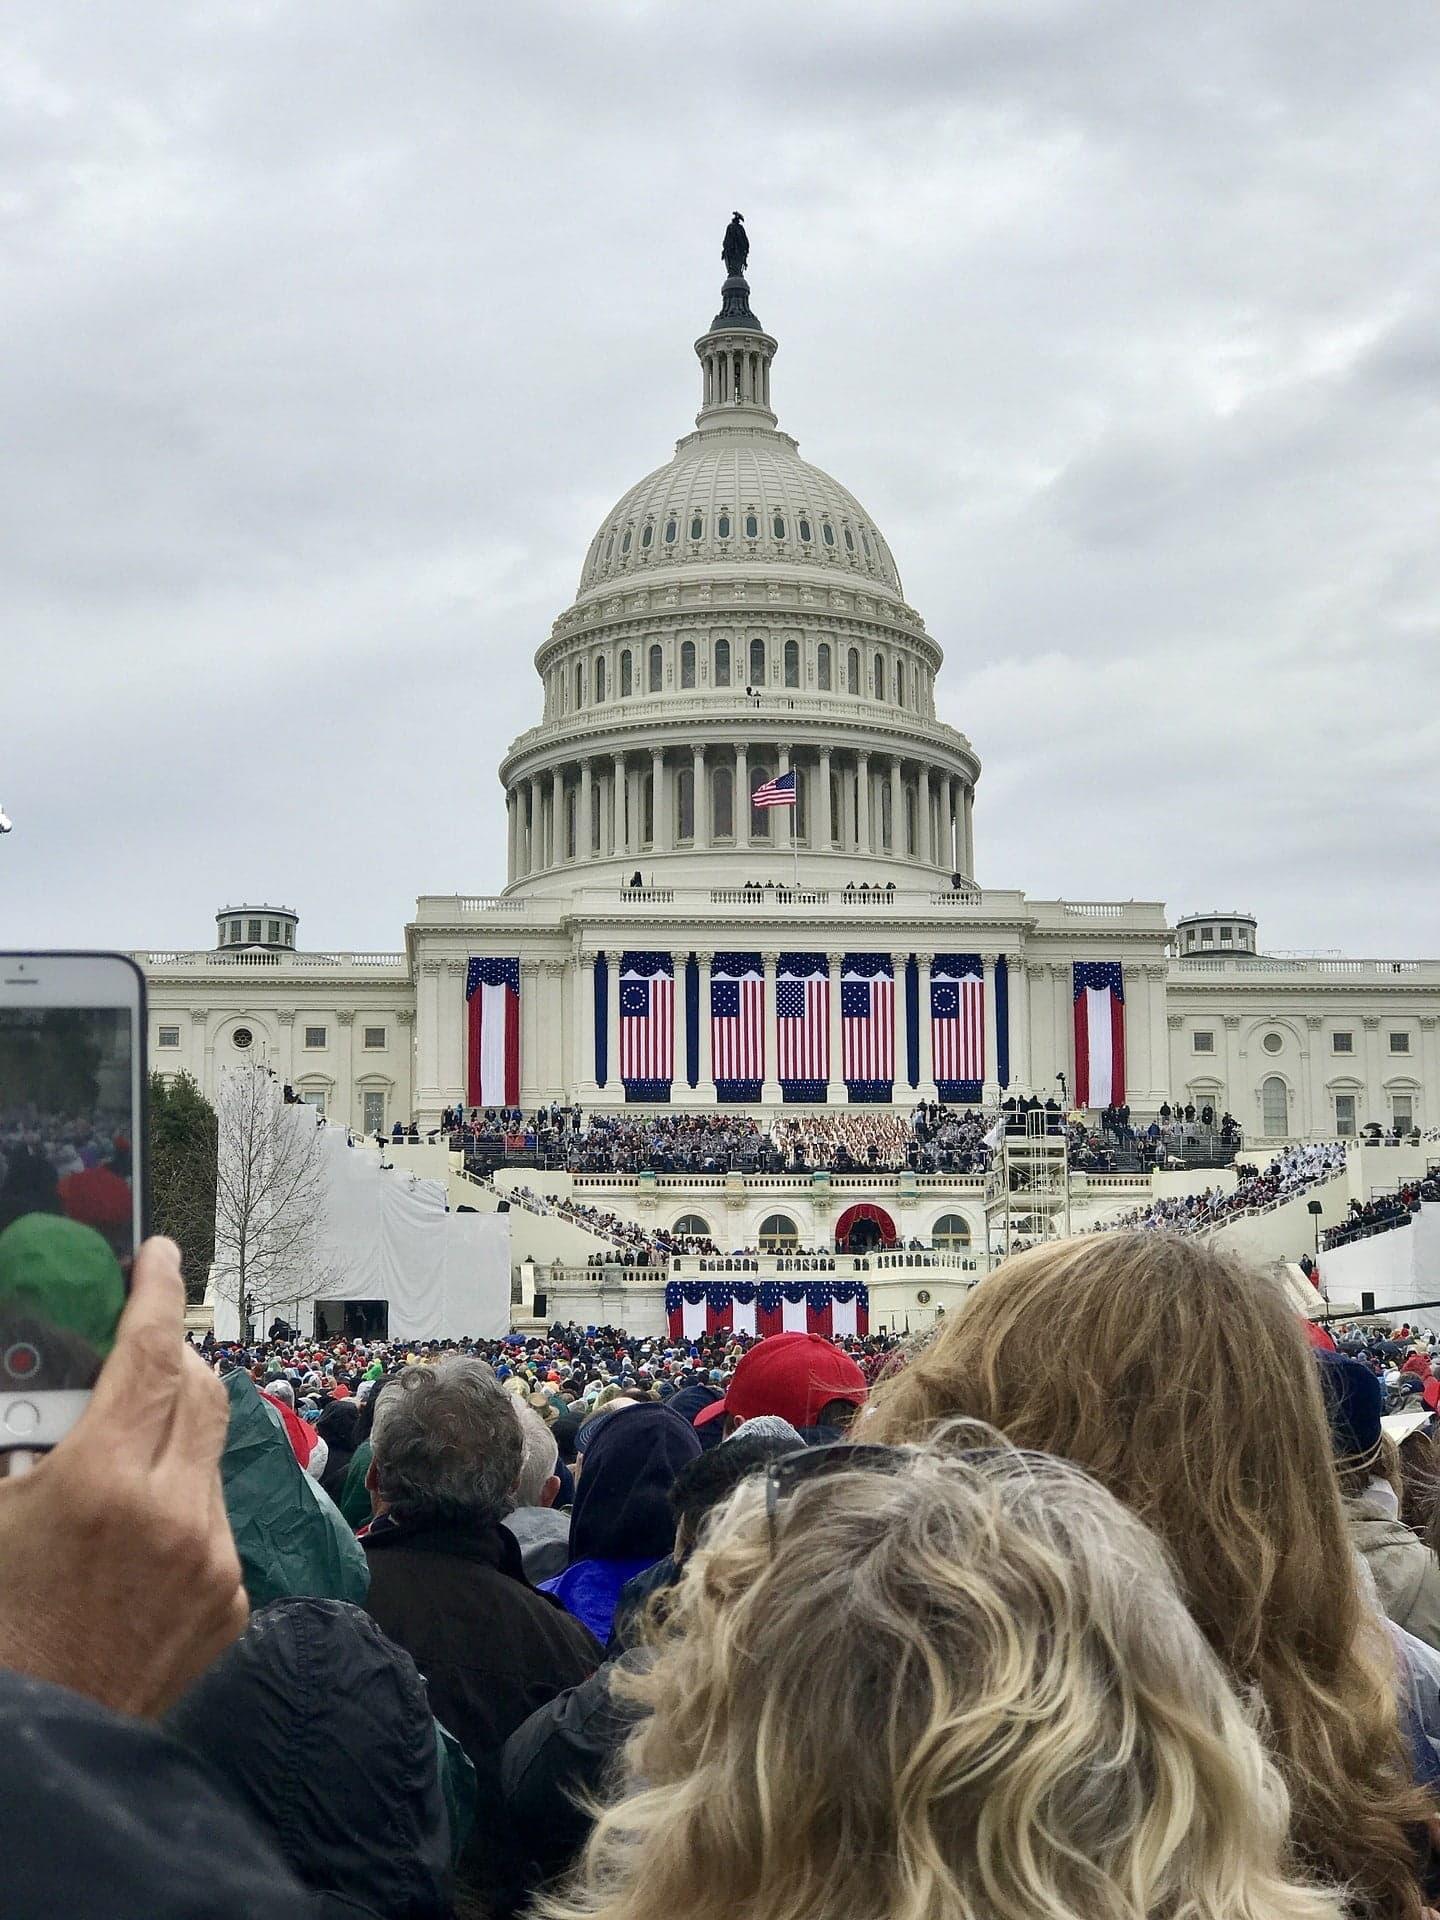 Read Amanda Gorman's powerful inauguration poem that calls for unity